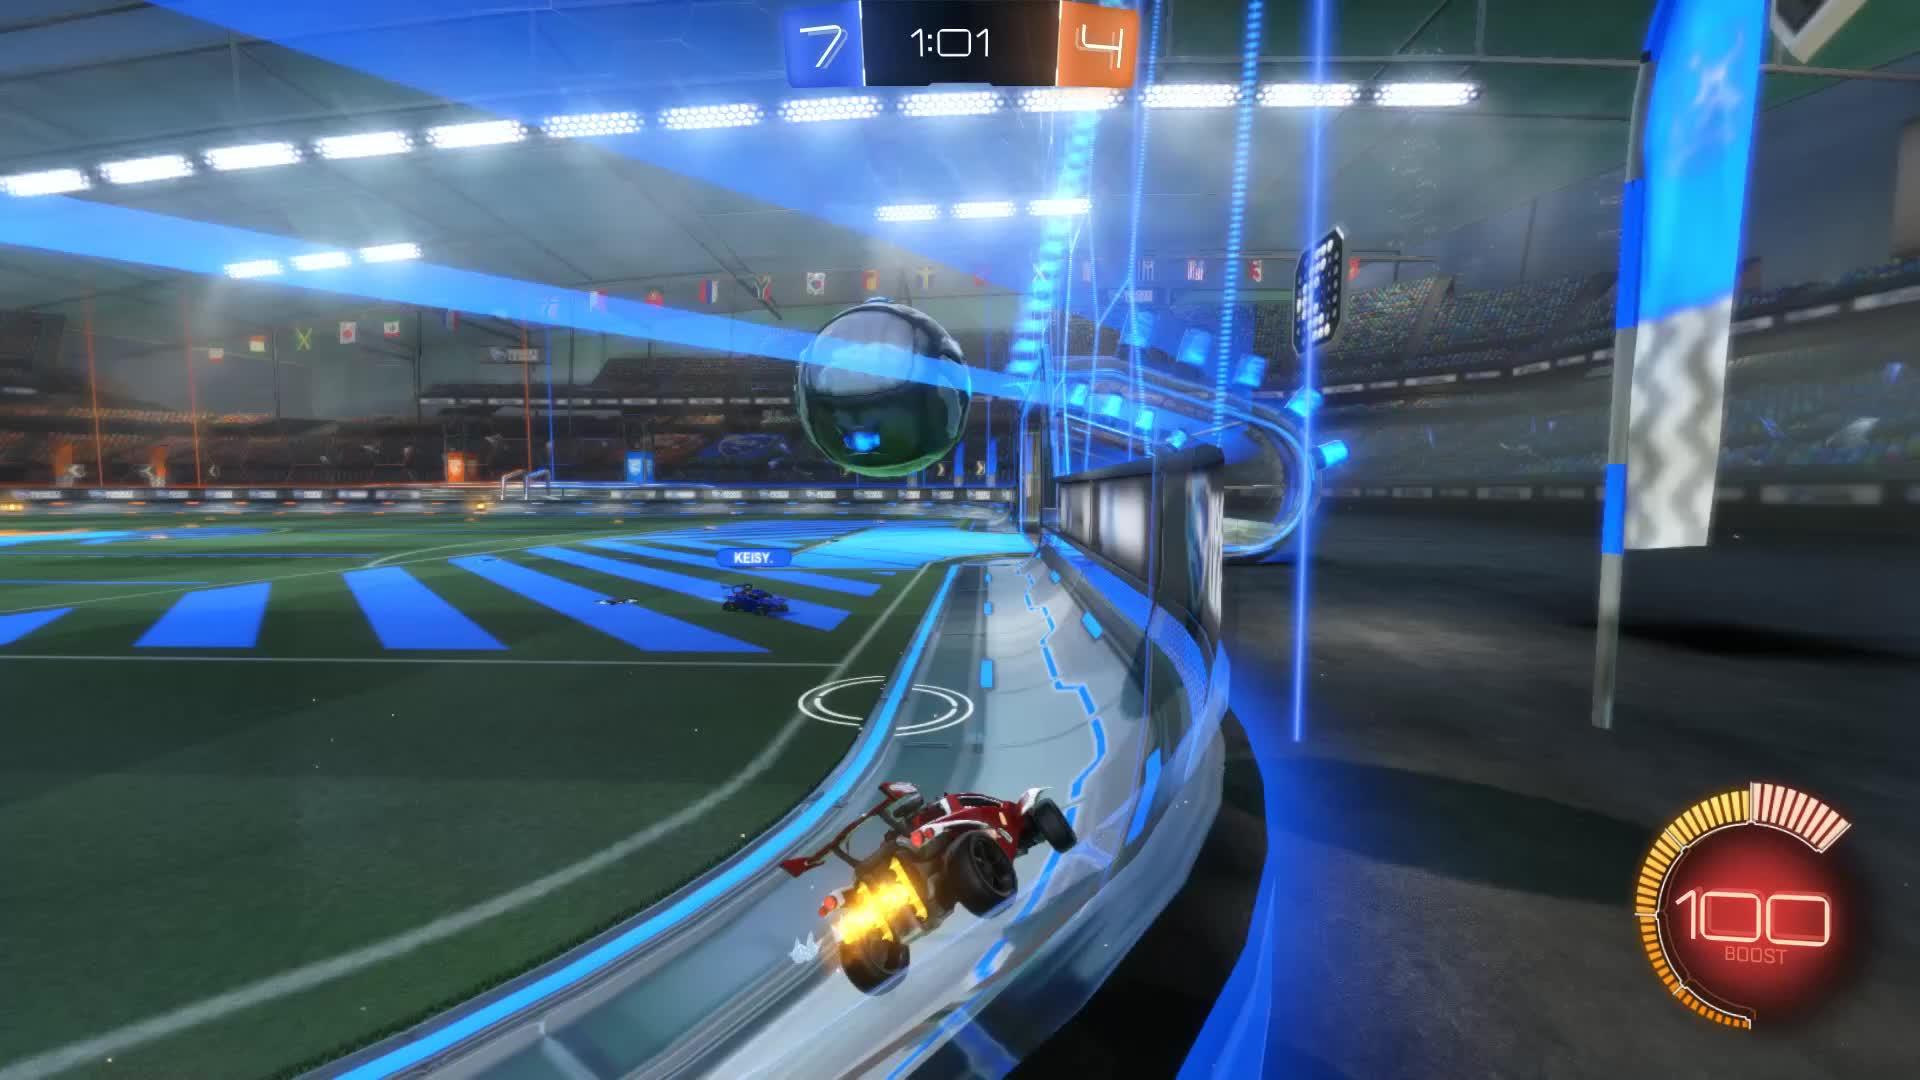 Gif Your Game, GifYourGame, Goal, How'd, Rocket League, RocketLeague, ⏱️ Goal 12: How'd GIFs